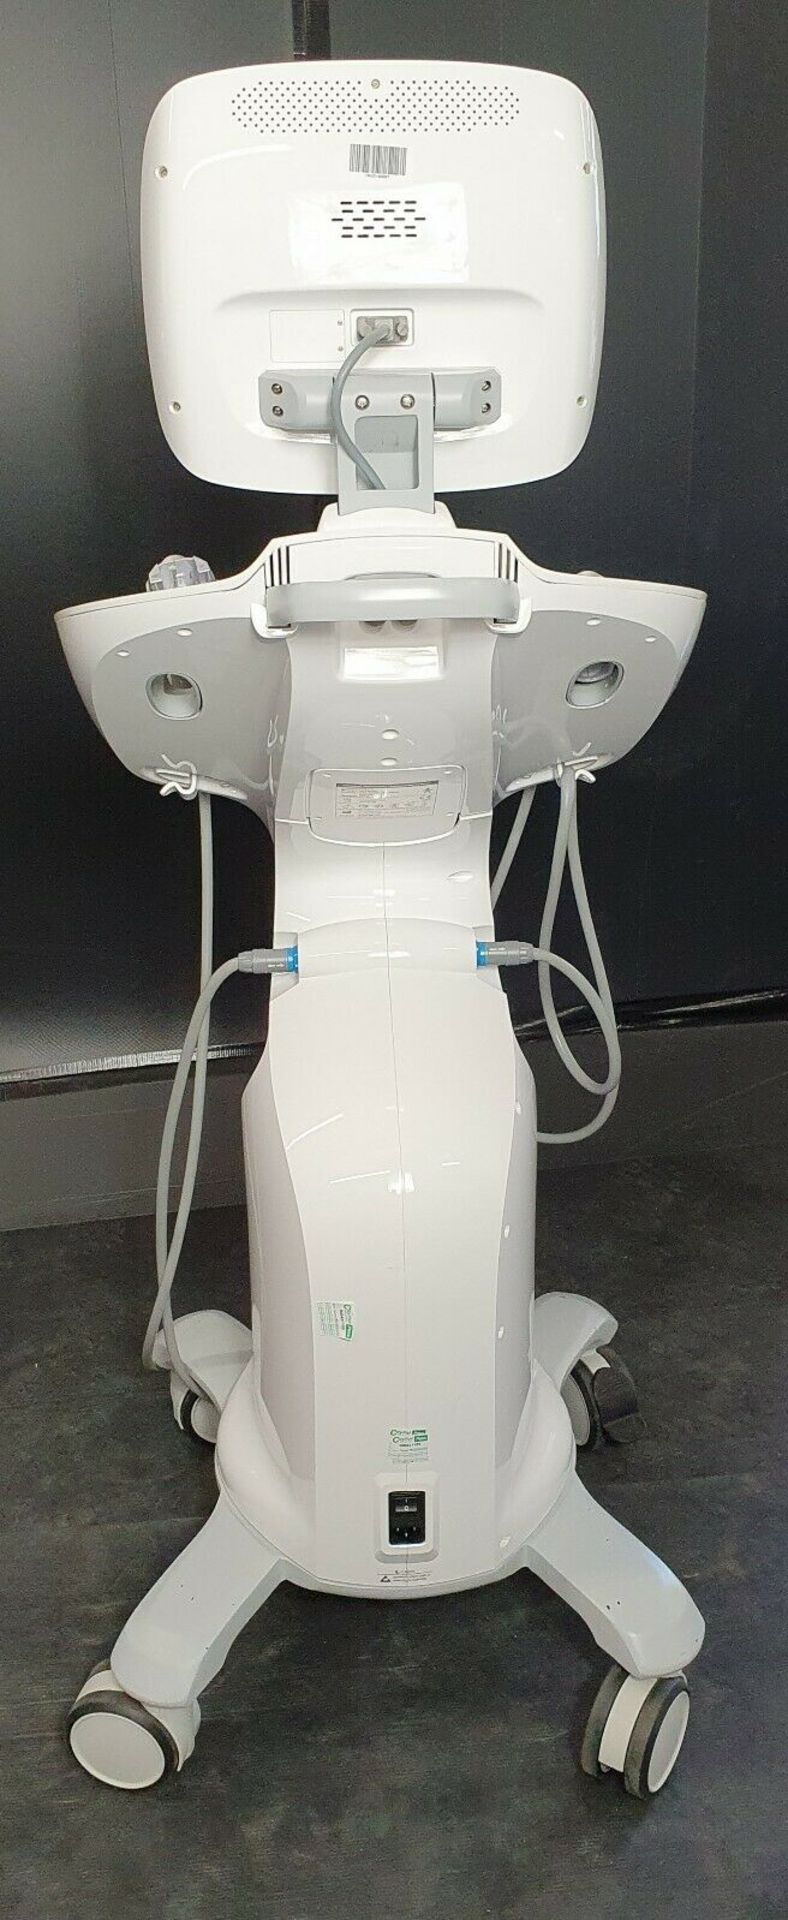 Lot 1 - Classy's UF3-M300 Focused Ultrasound Ultraformer | YOM: 2016